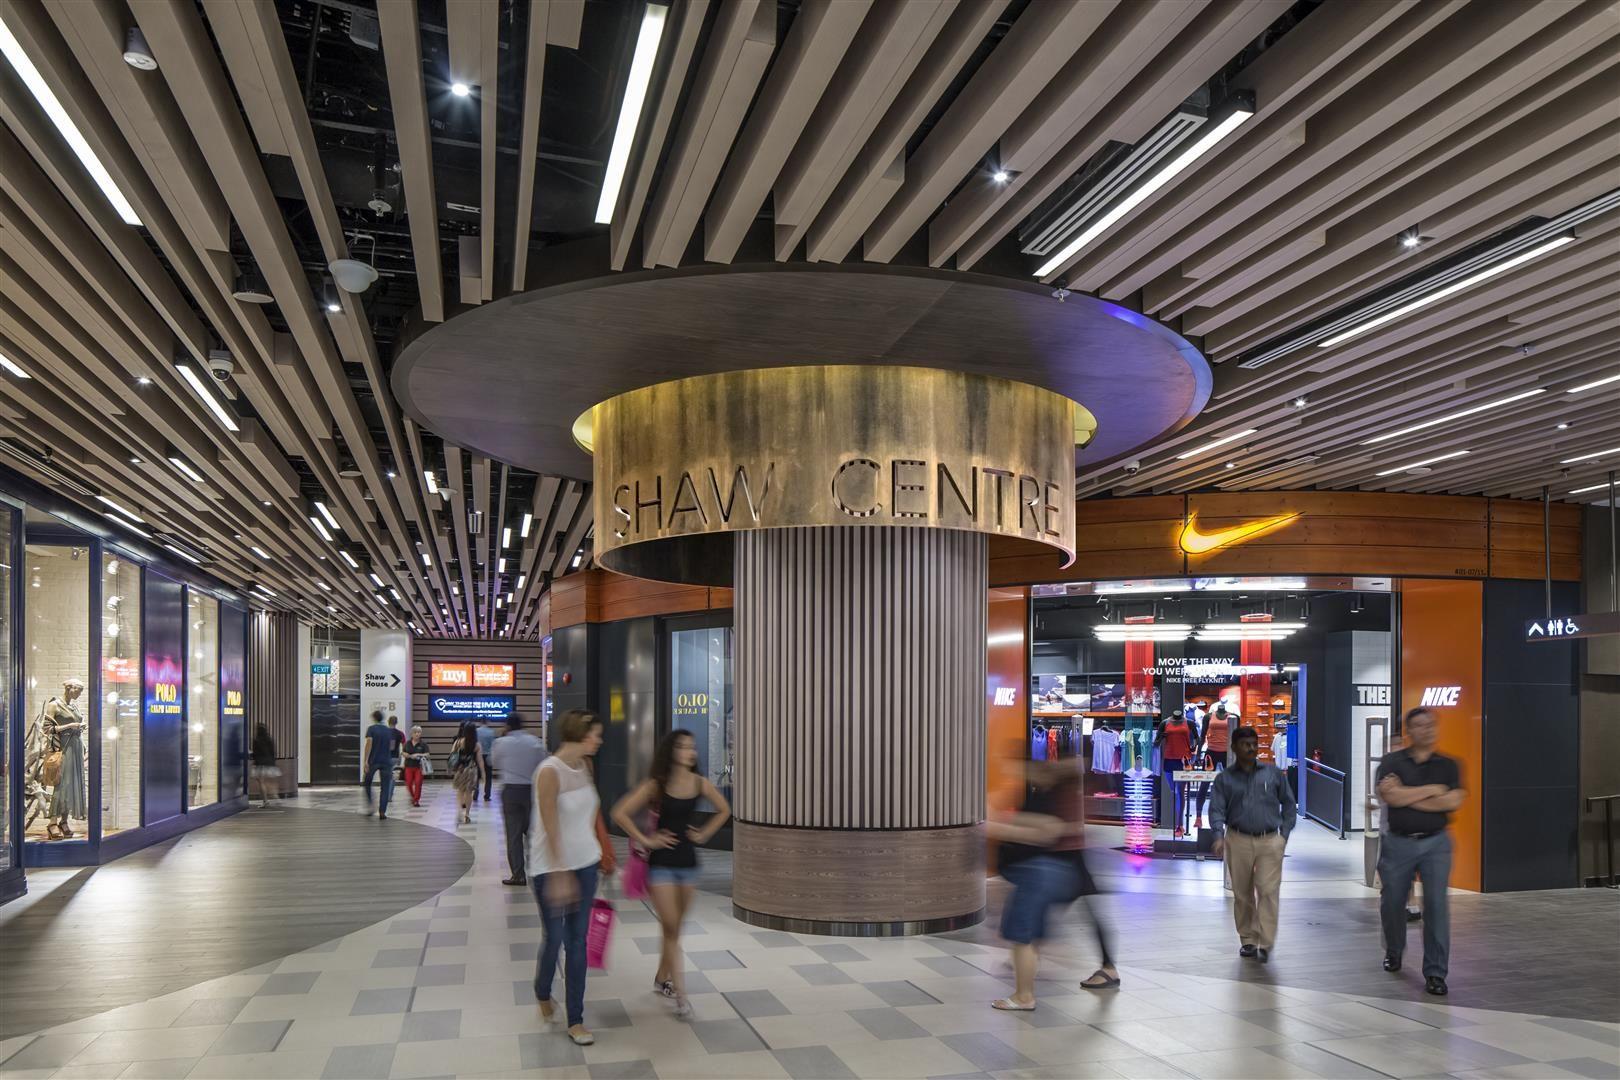 Column Design Signage Ceiling Design Mall Corridor At Shaw Centre Singapore By Dp Design Shopping Mall Design Shopping Mall Interior Mall Design